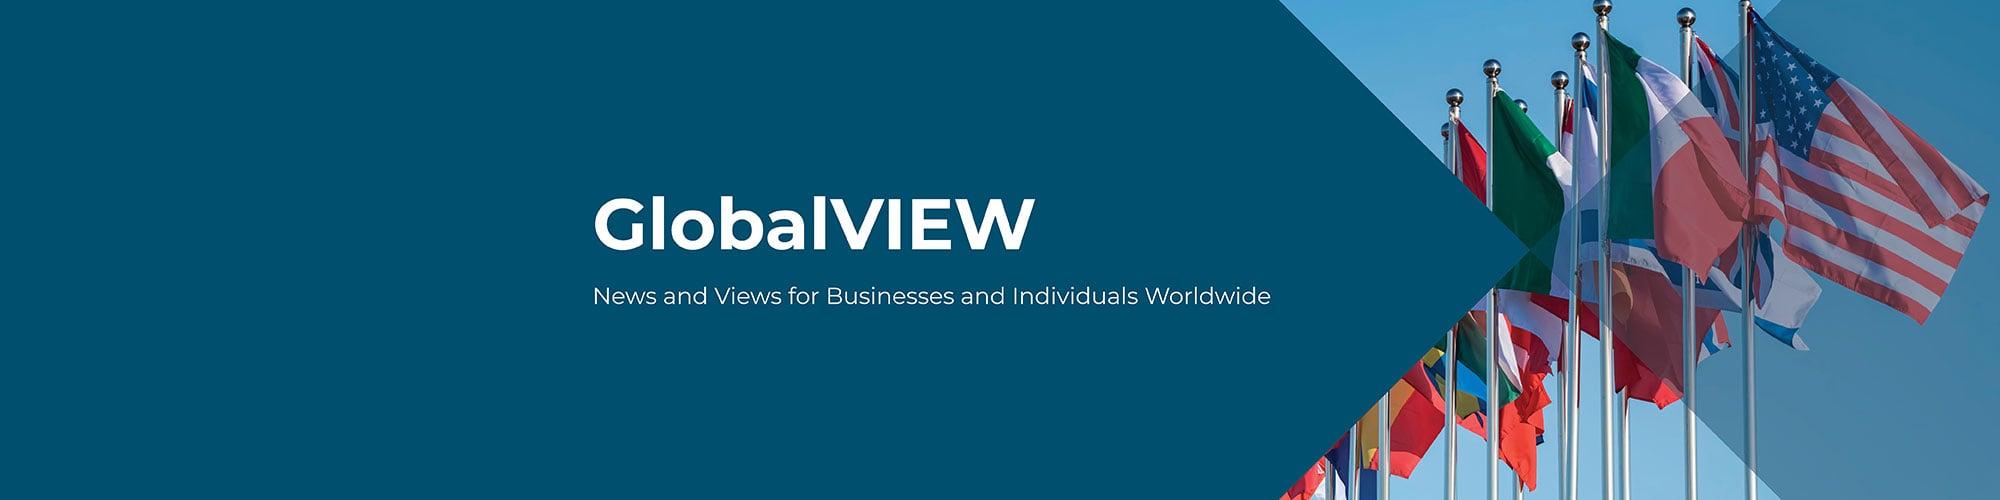 GlobalVIEW-Webpage-Header-final-2